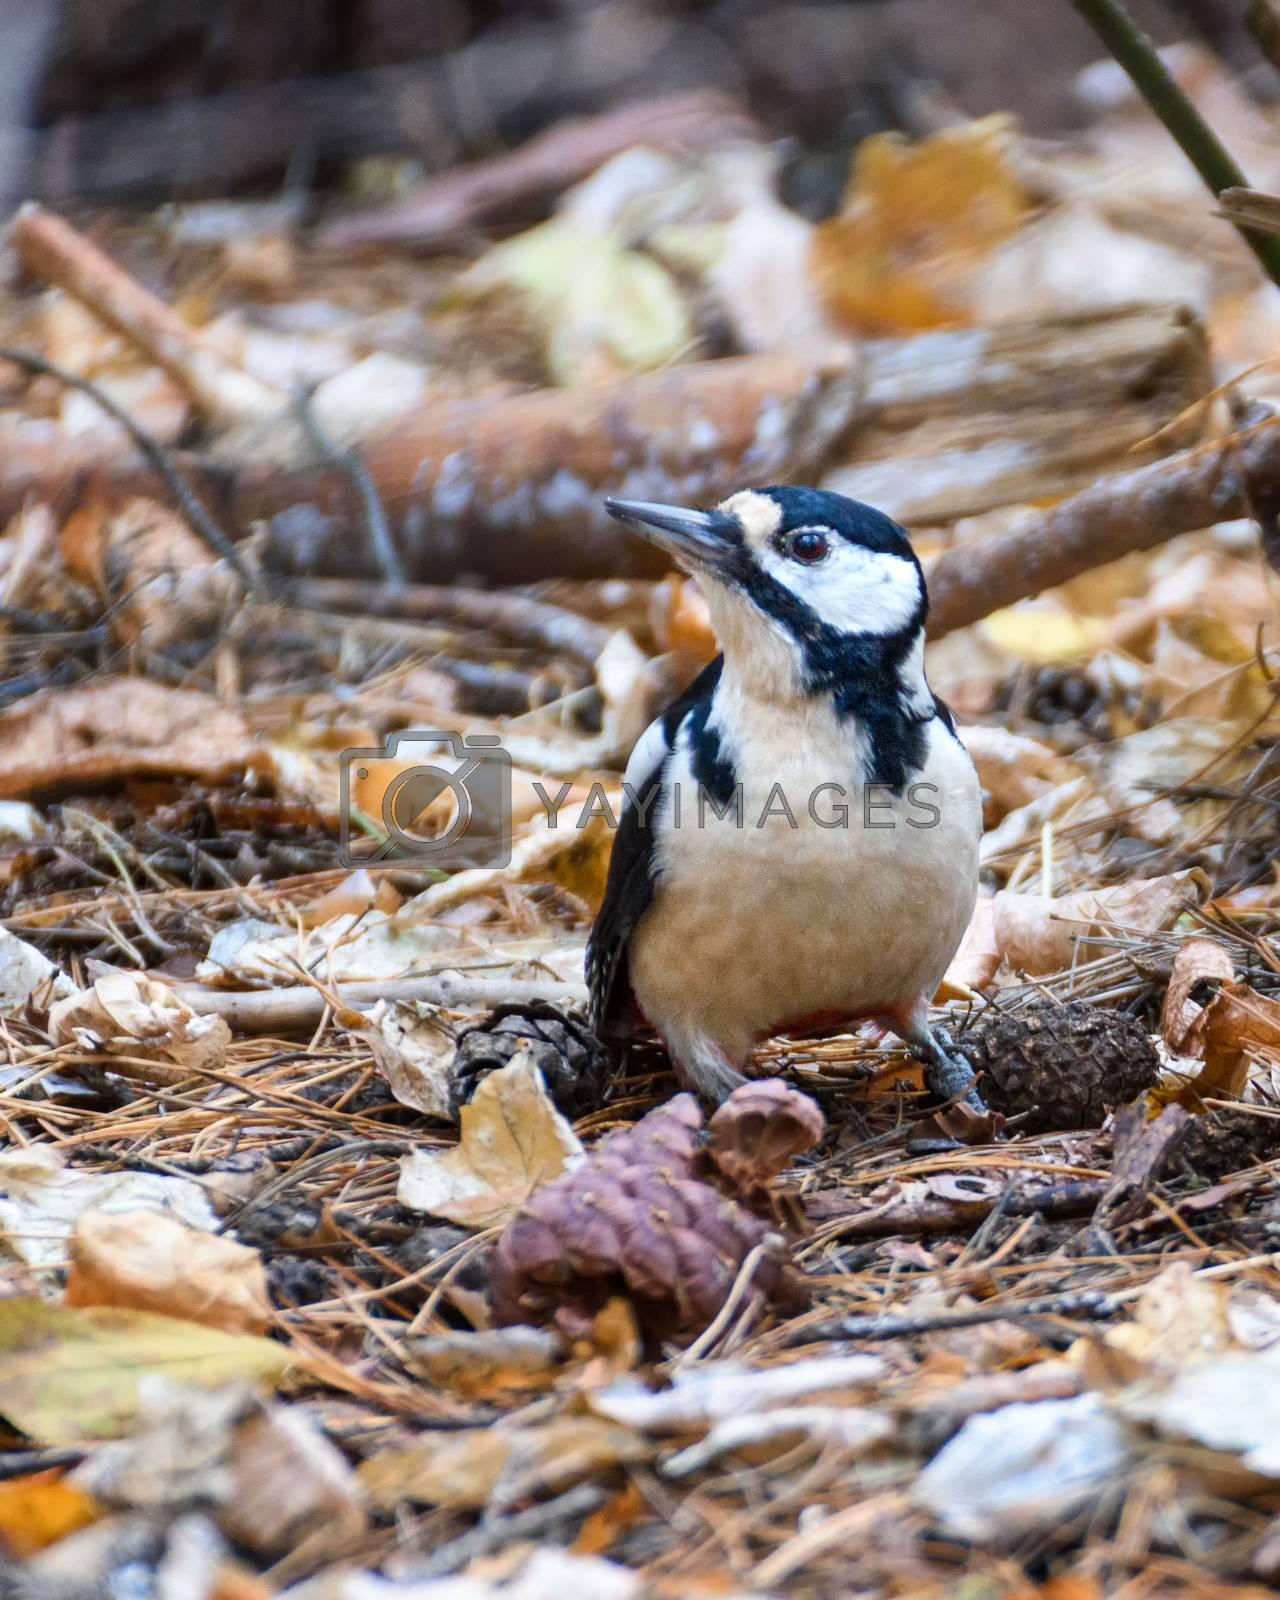 Royalty free image of Woodpecker sitting on fallen leaves by VladimirZubkov